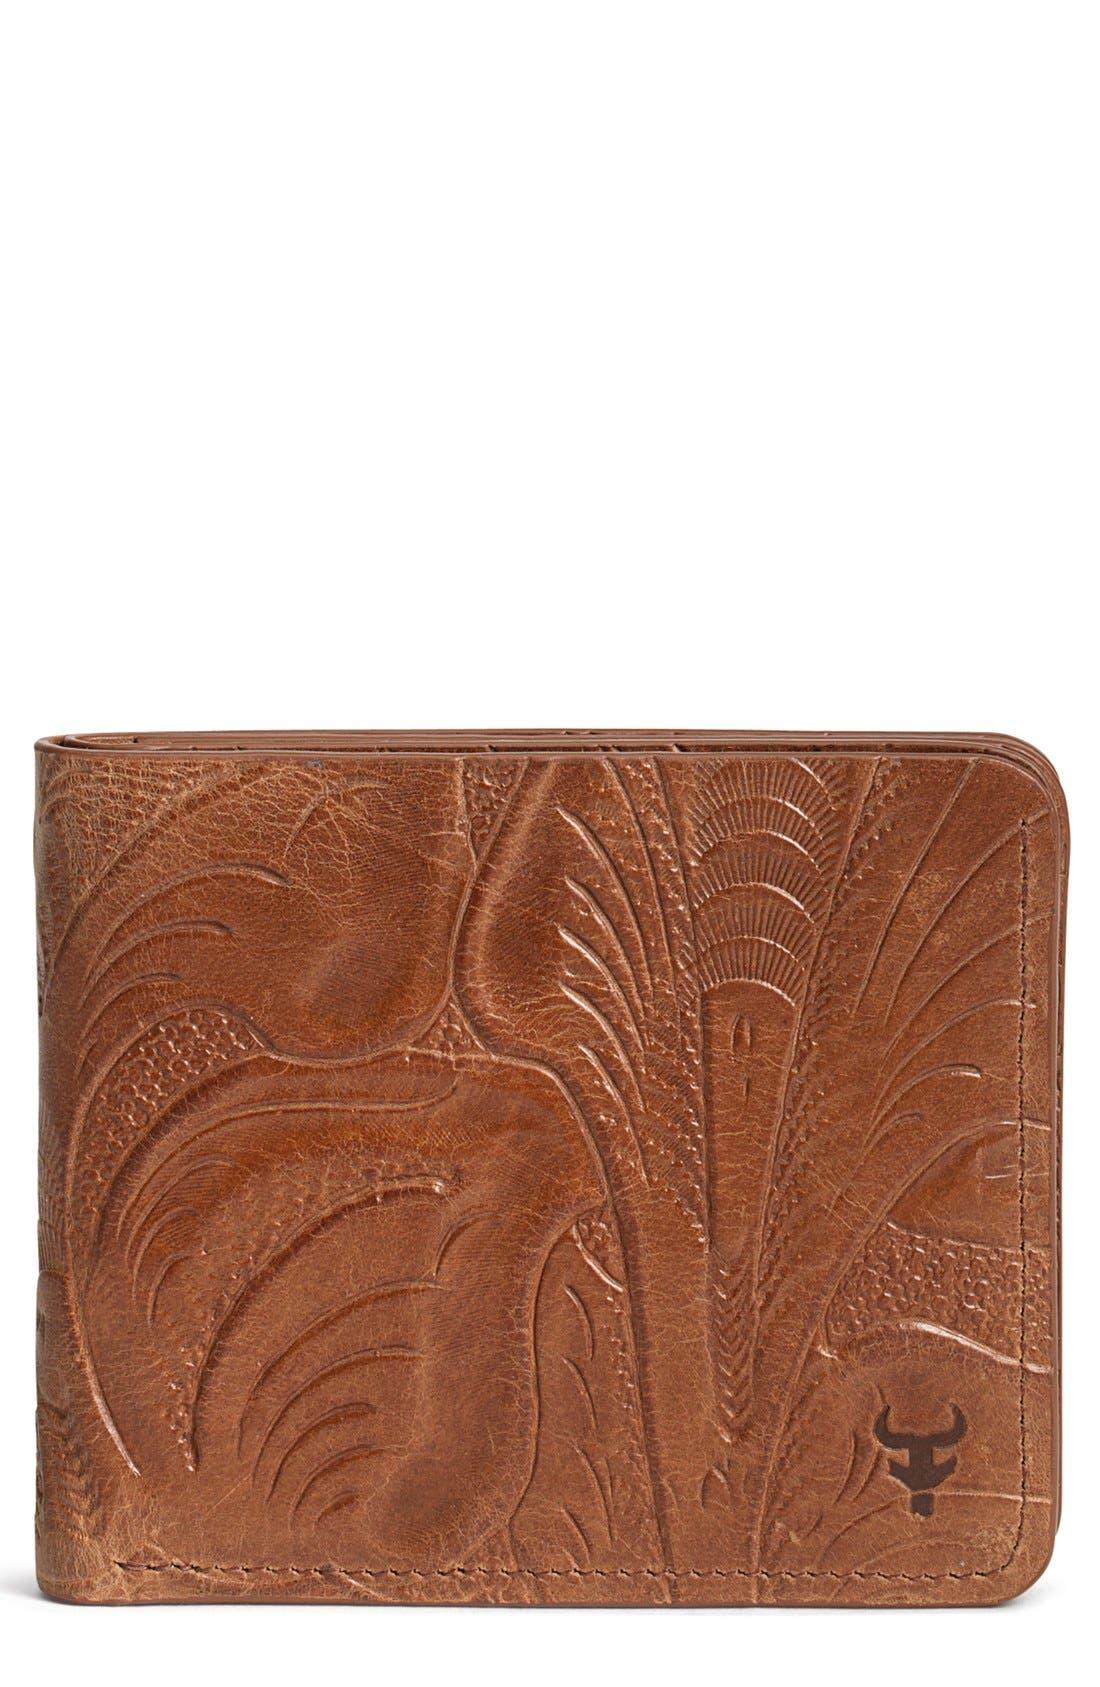 'Jackson' Slimfold Italian Steer Leather Wallet,                             Main thumbnail 1, color,                             TAN